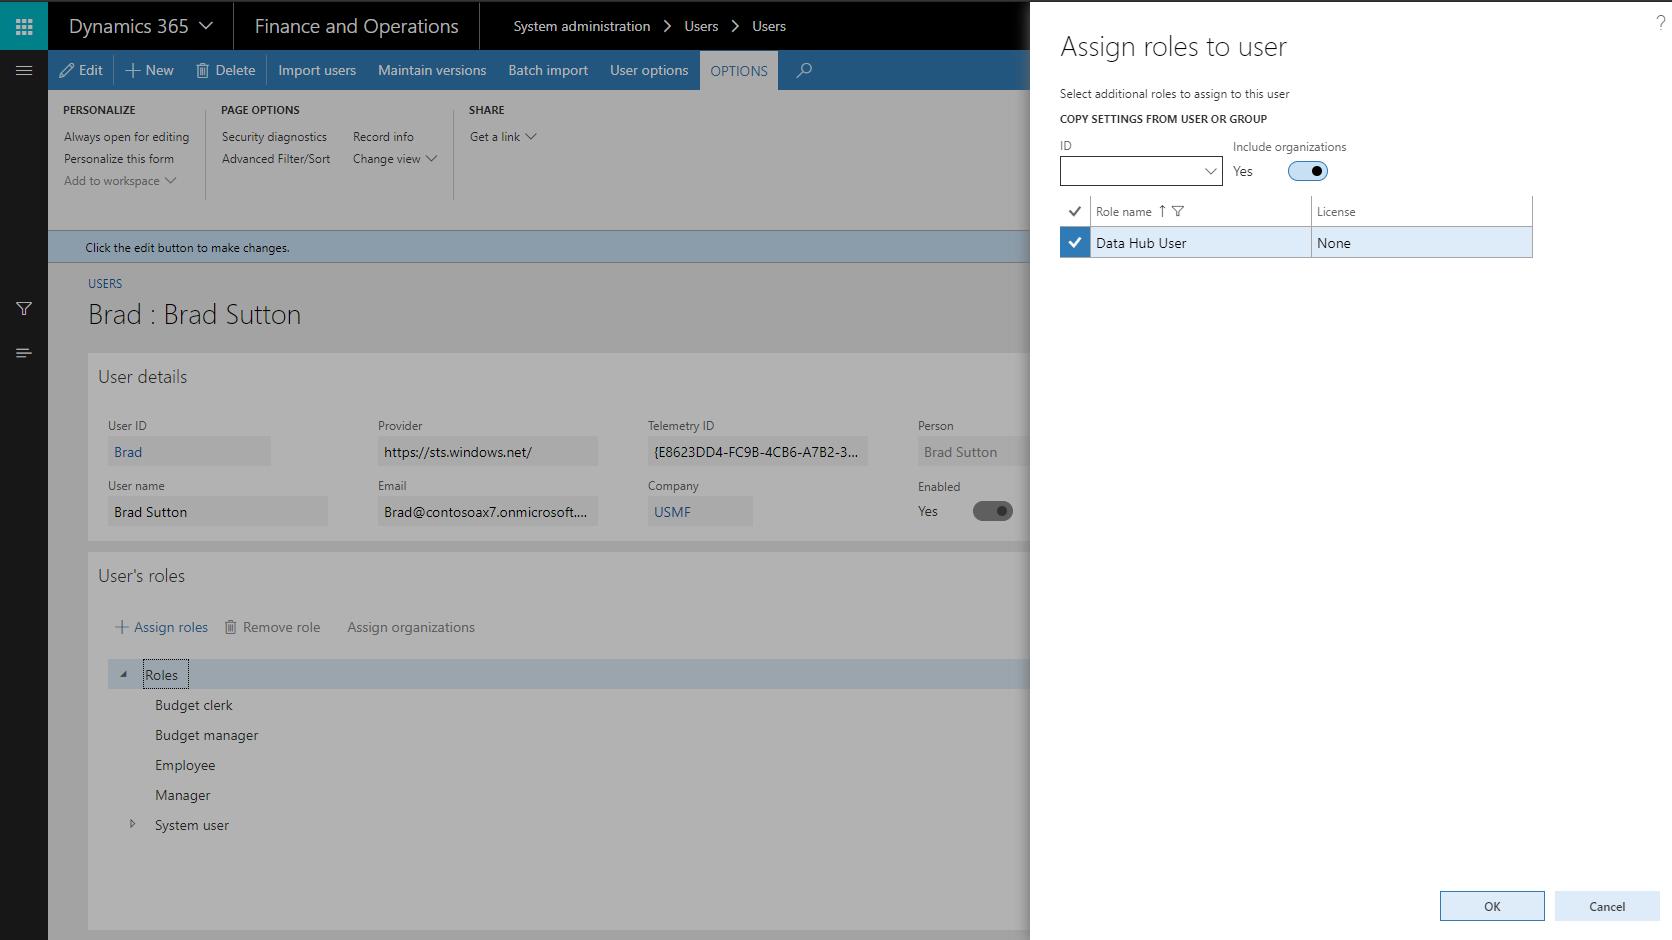 Adding the Microsoft Dynamics 365 Finance & Operations